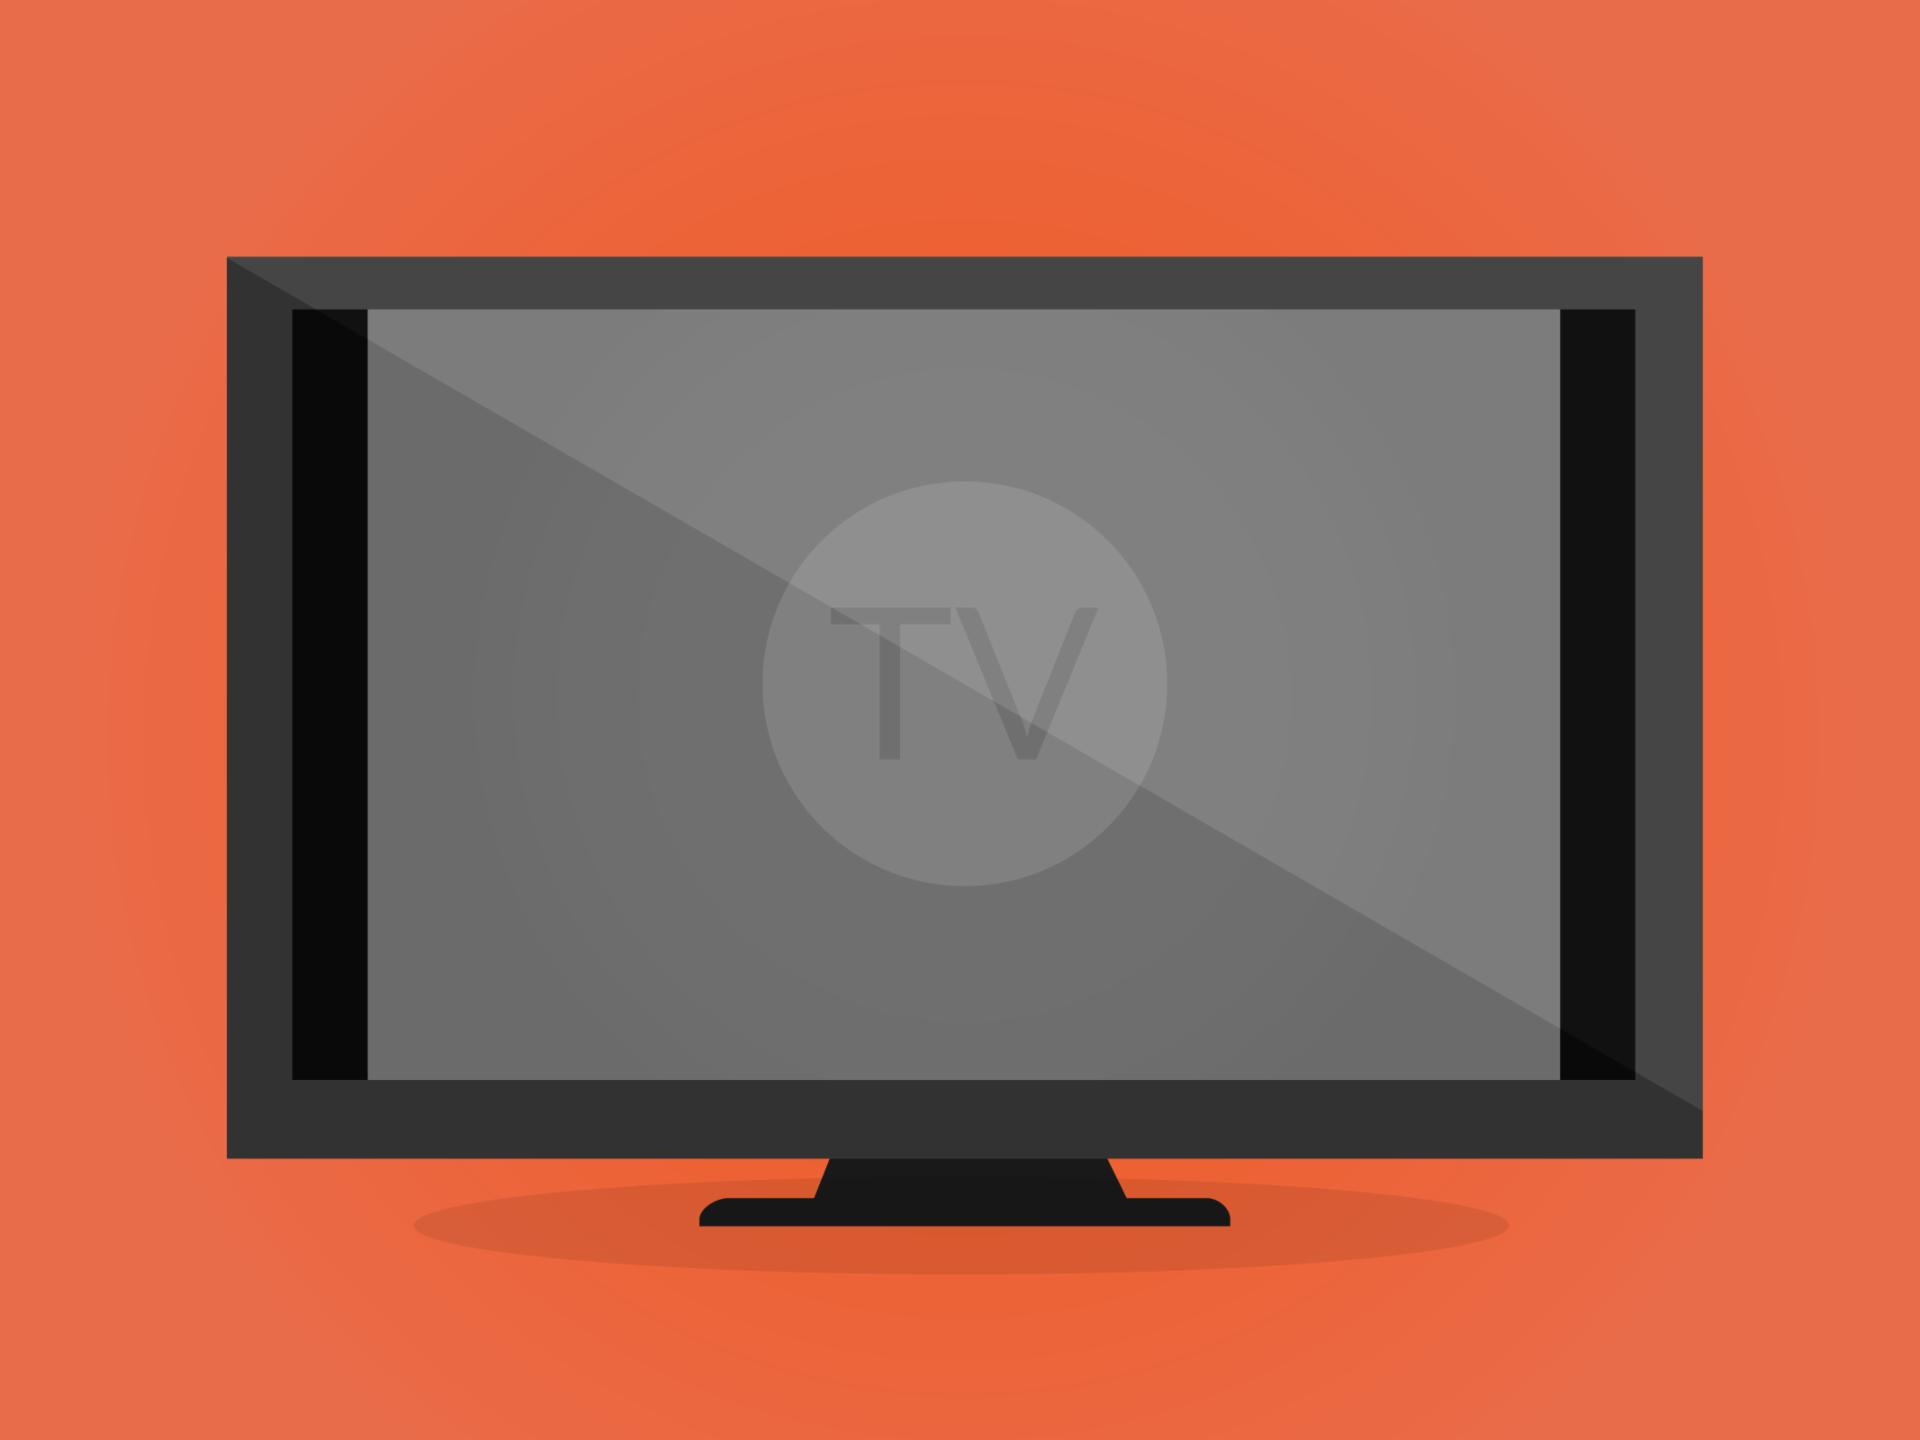 Televisores, smartTV, TV